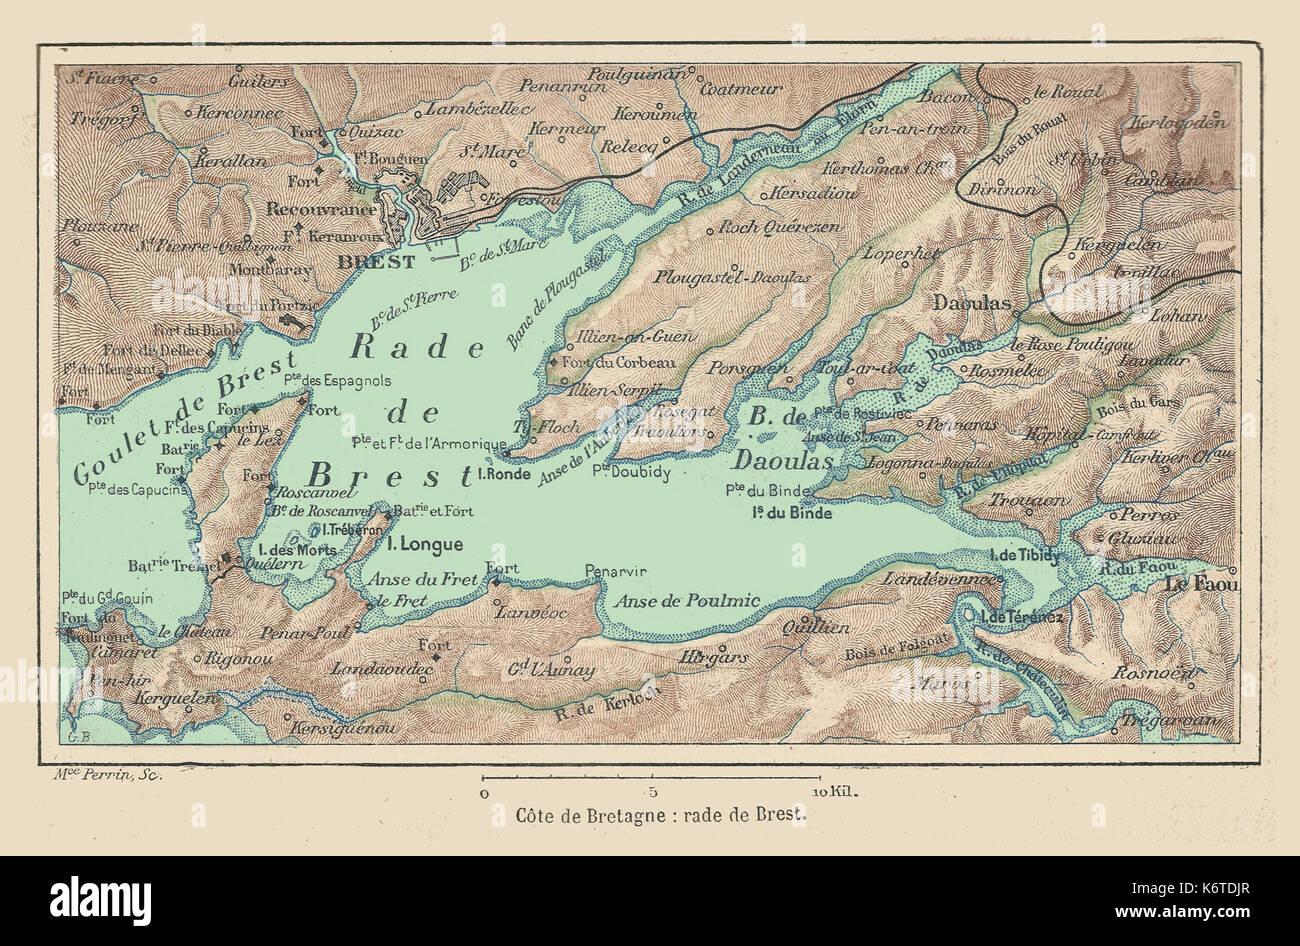 Map Brest France Stockfotos & Map Brest France Bilder - Alamy